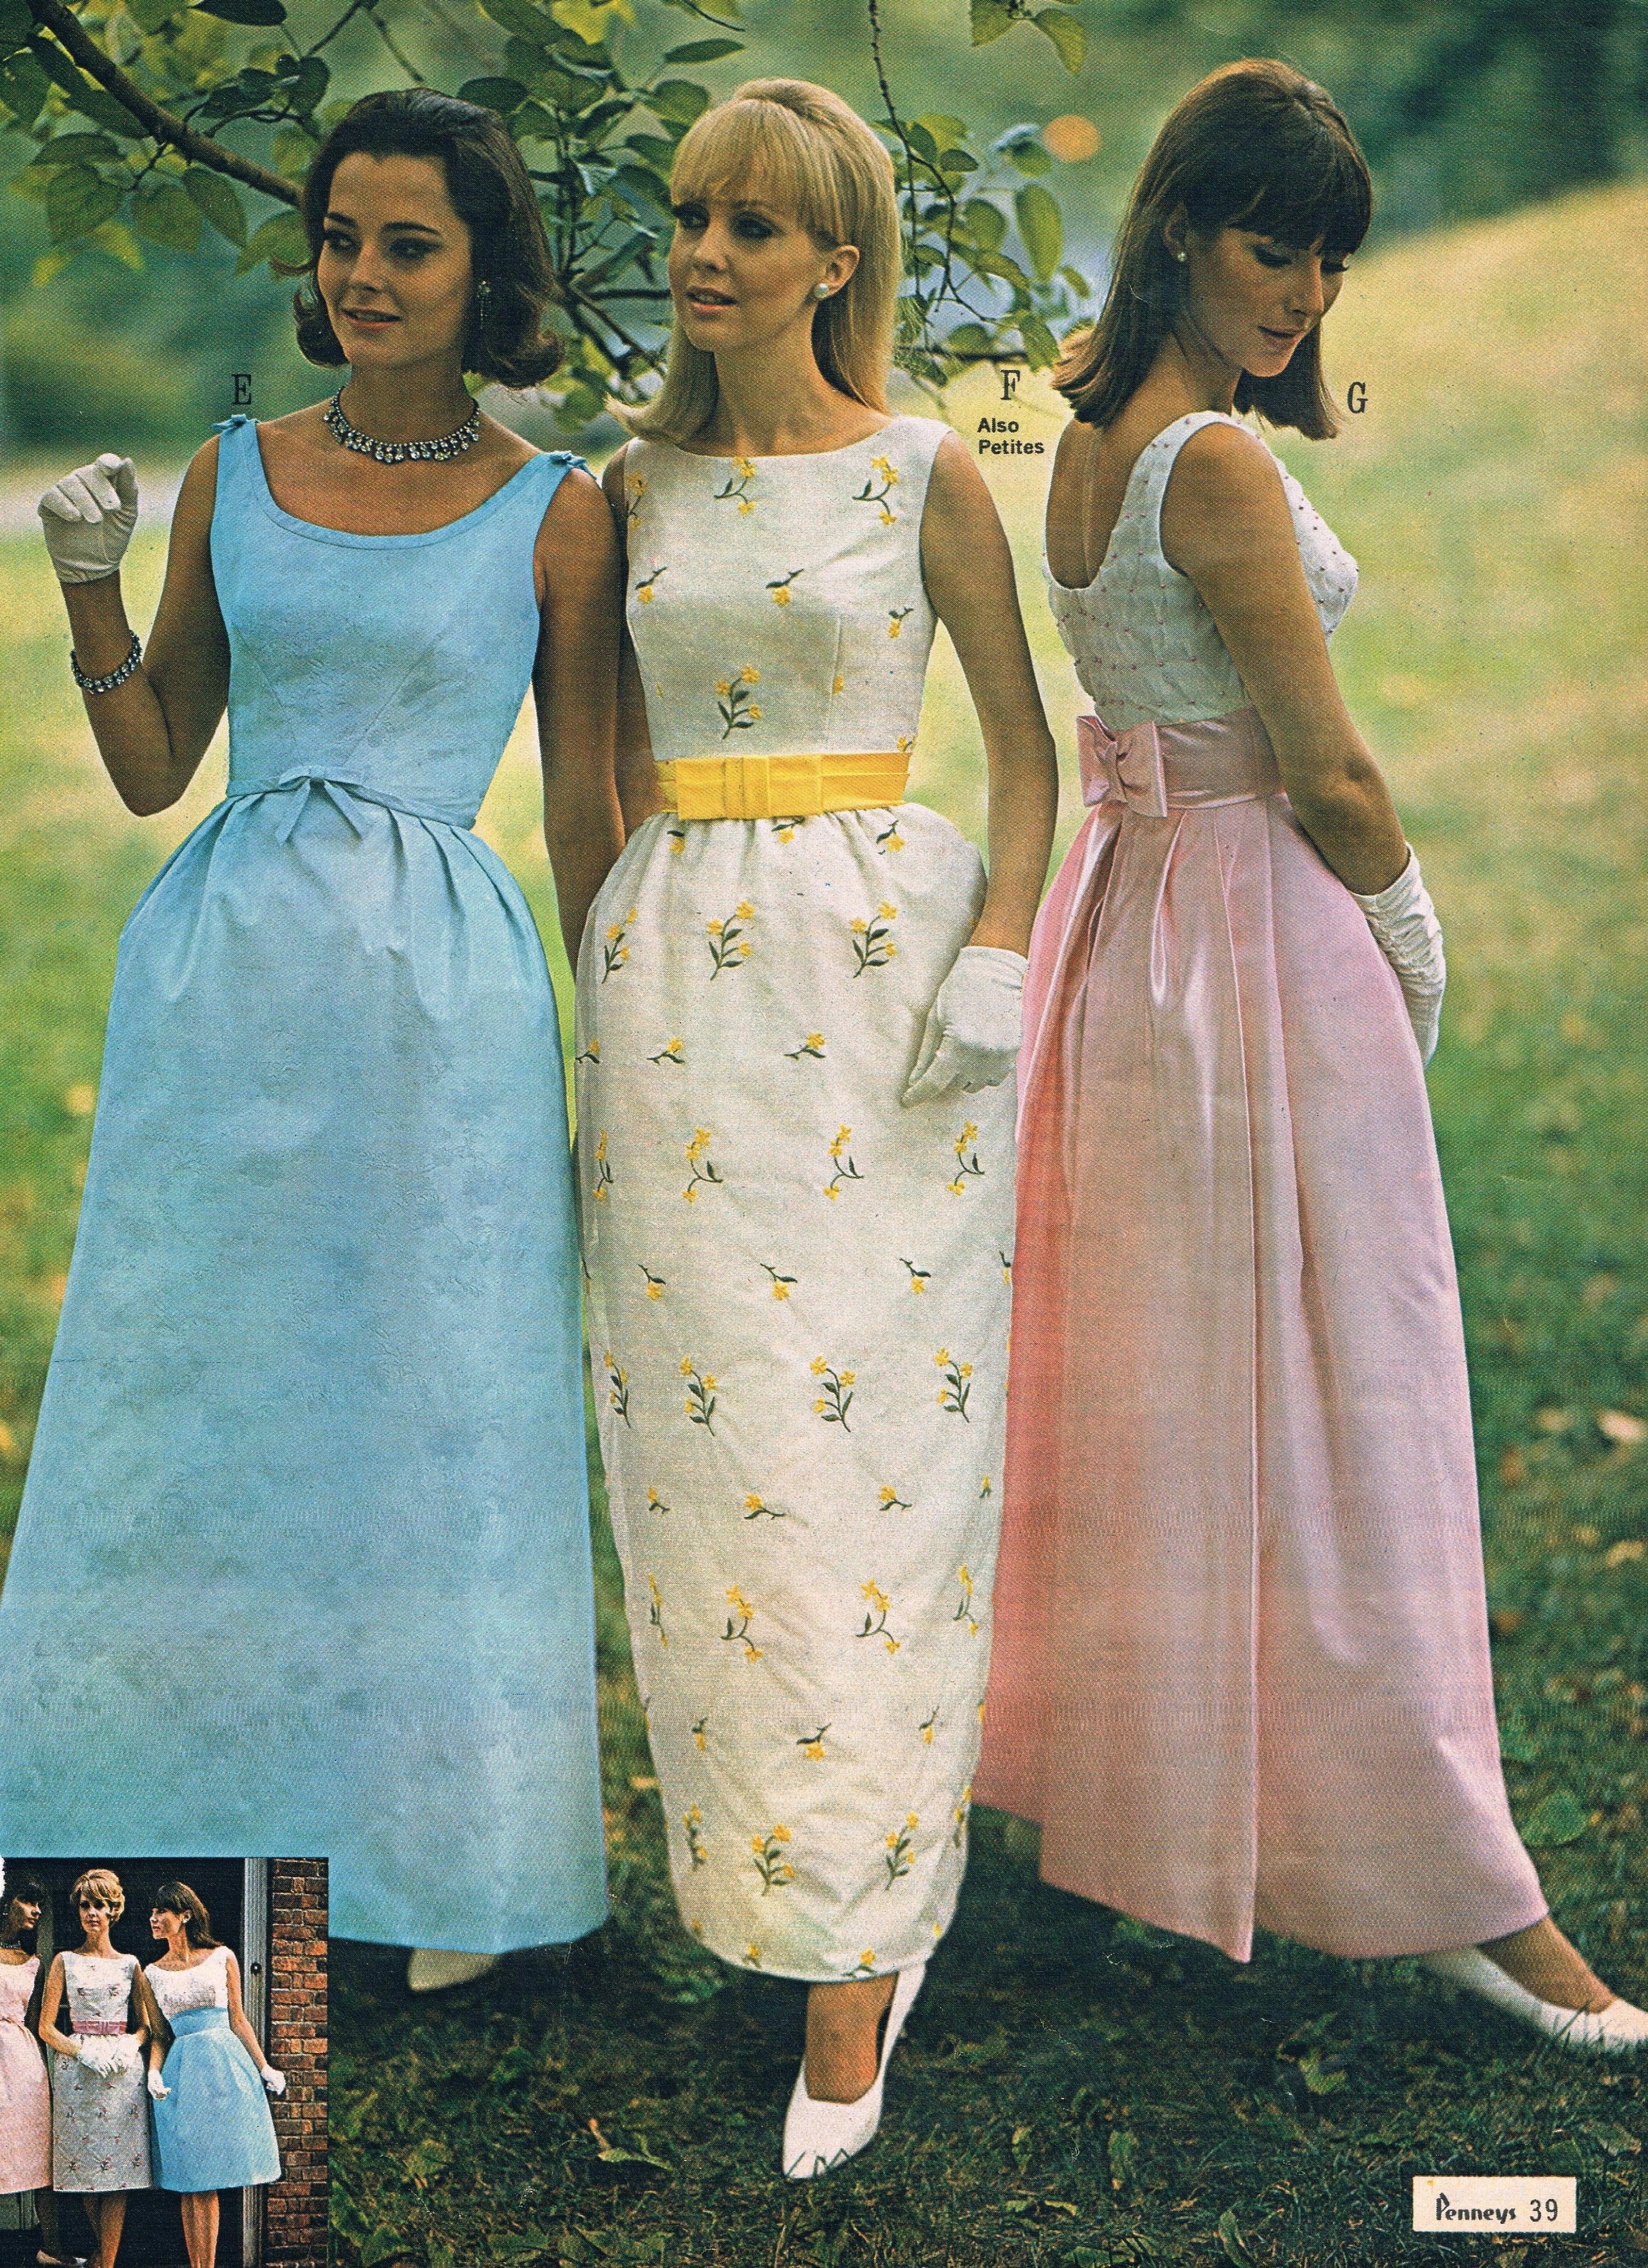 Penneys Catalog 60s Vintage Bridal And Bridesmaid